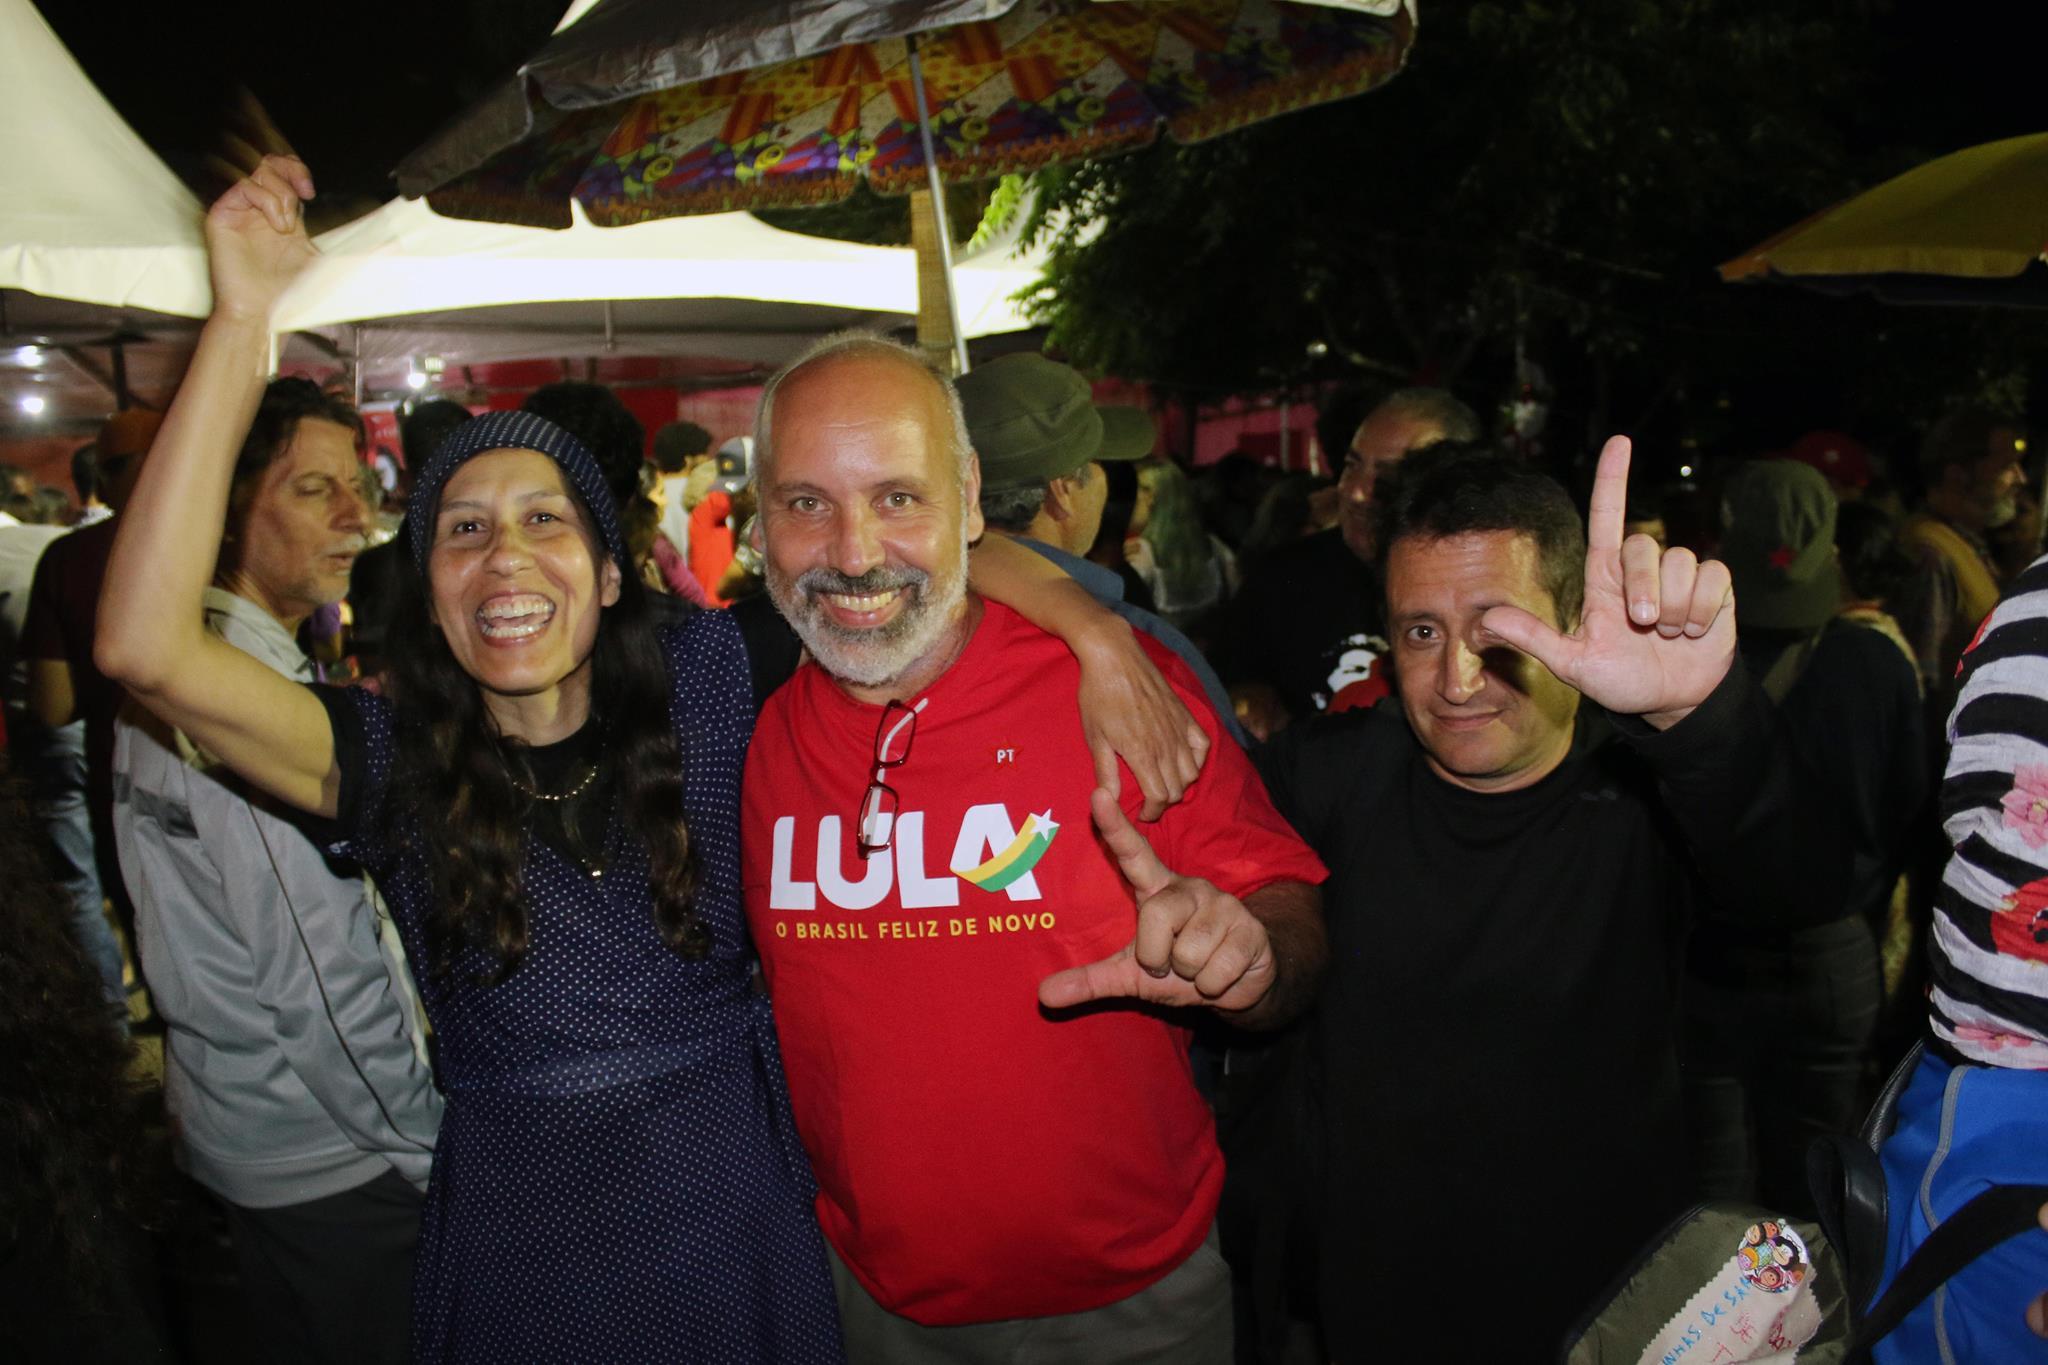 FOTO38-Jornalistas Livres